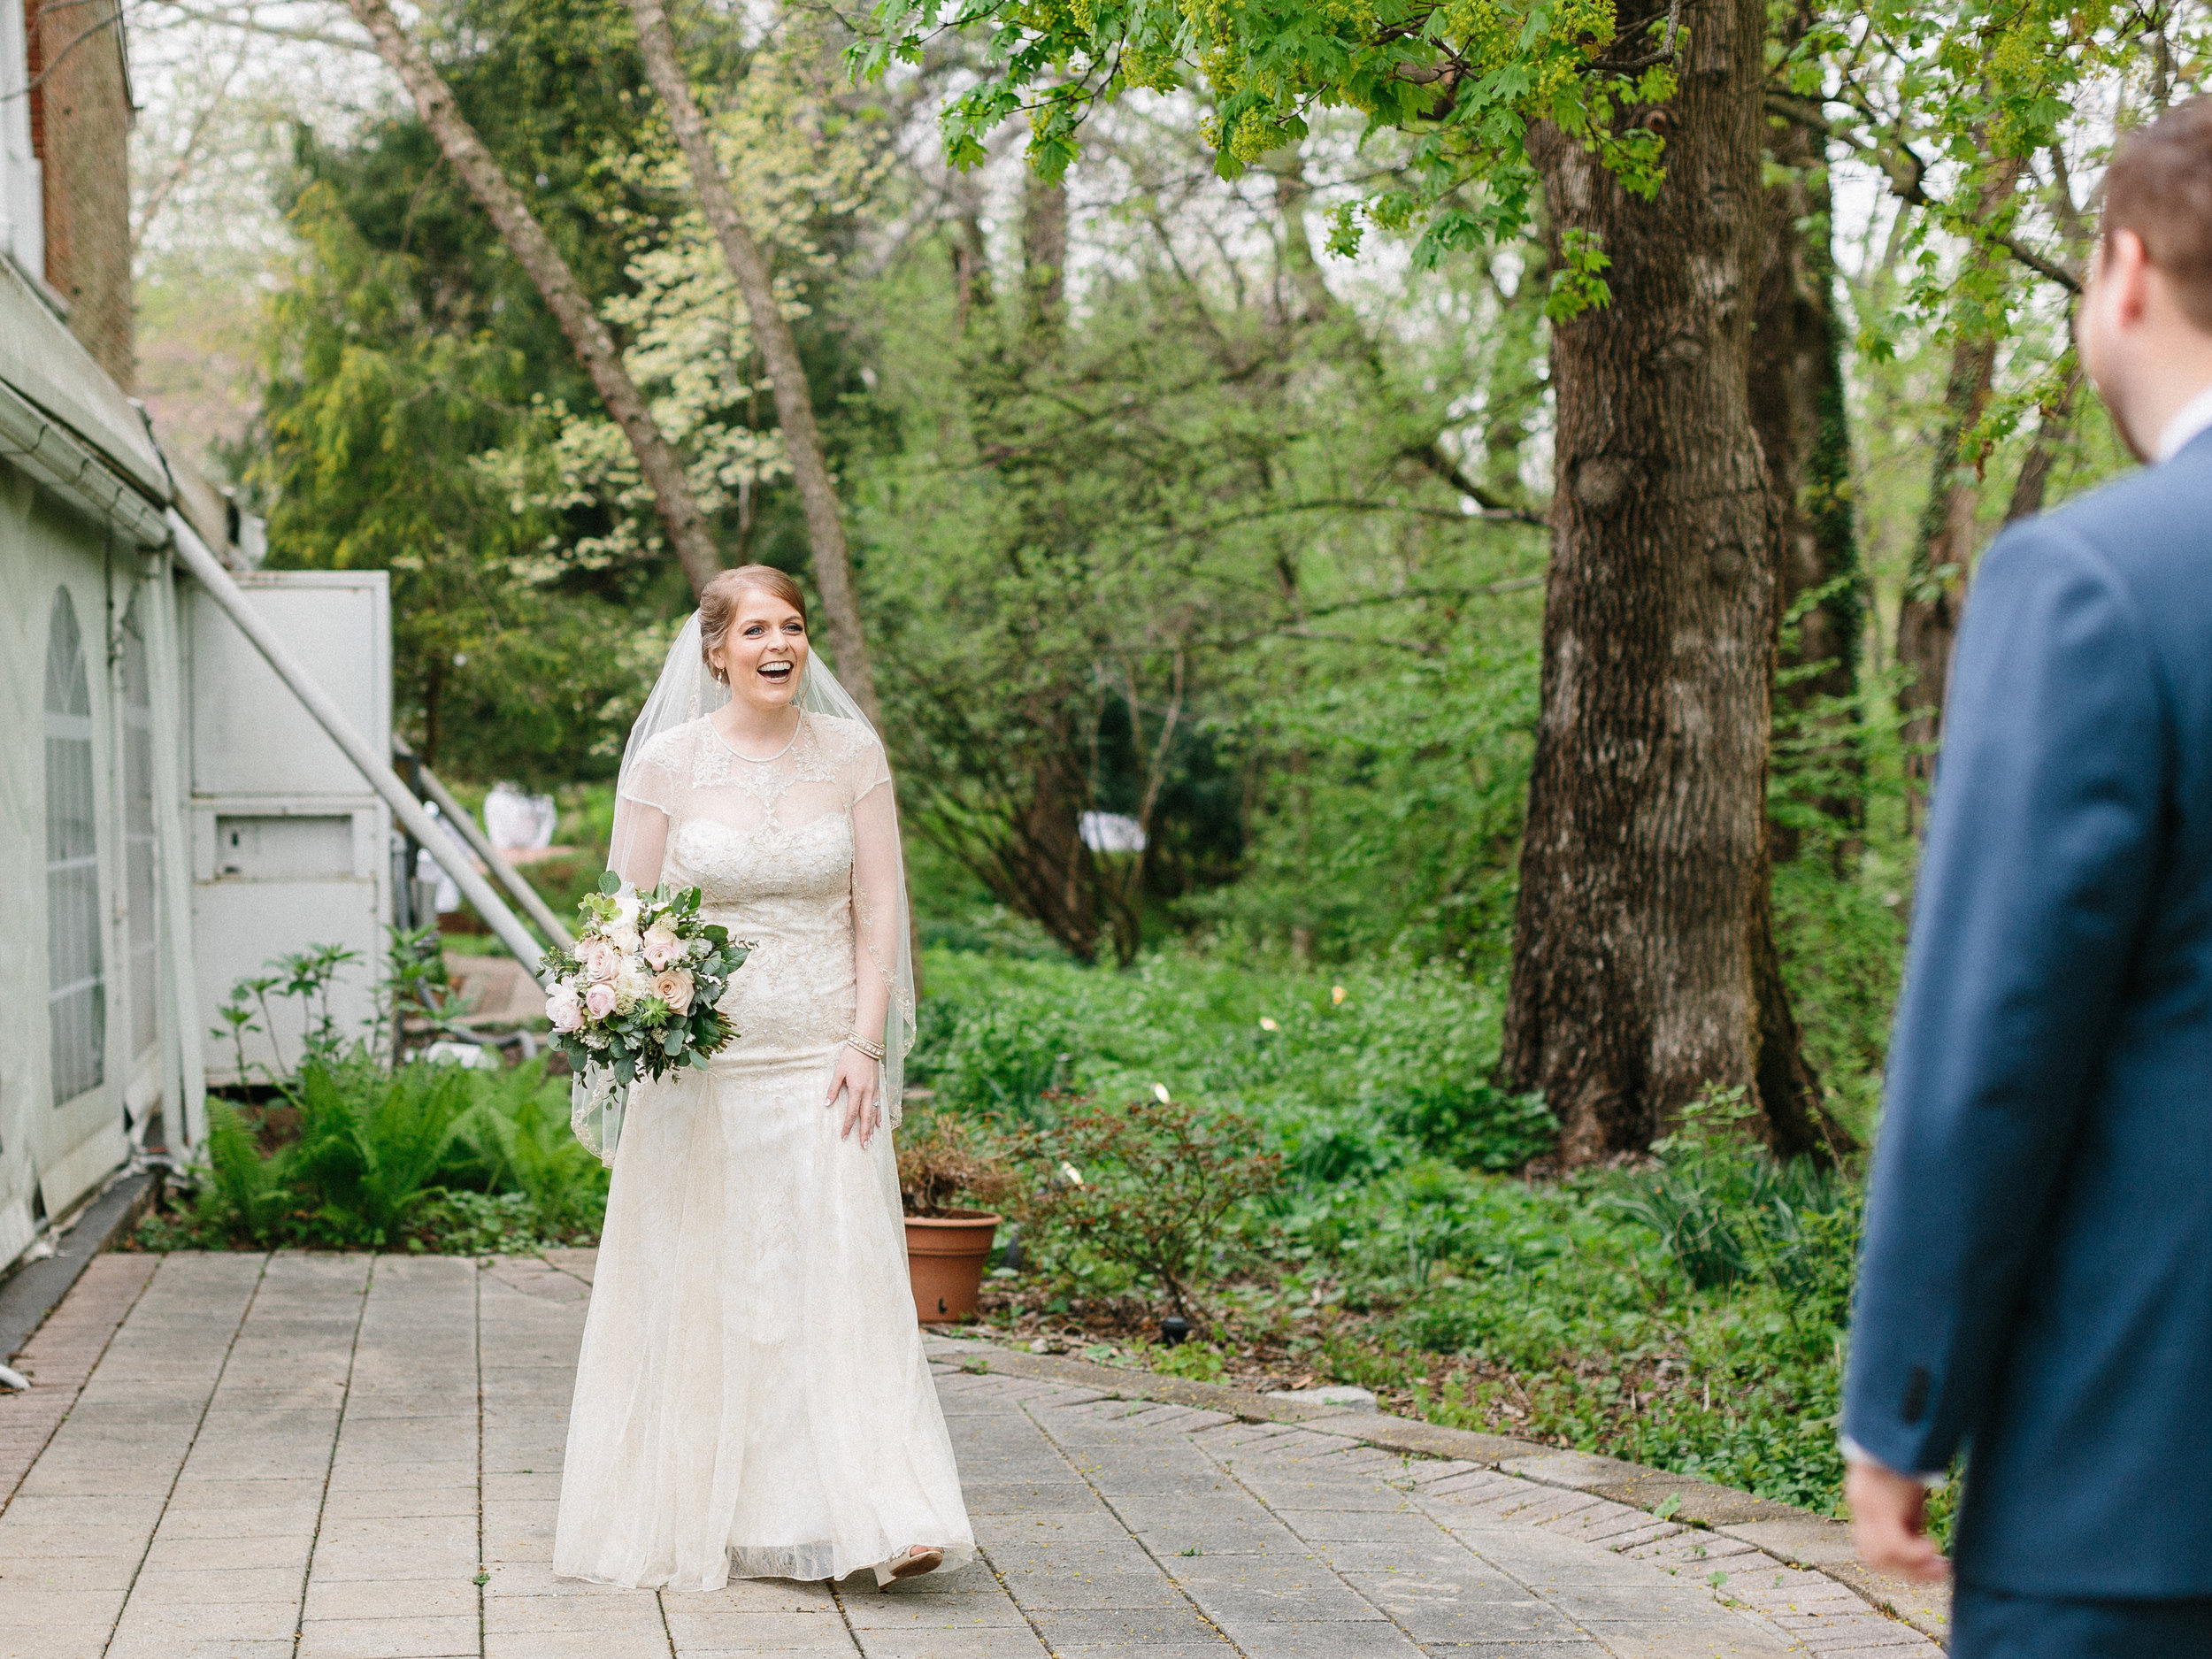 20180428-zakula-molczyk-wedding-067.jpg